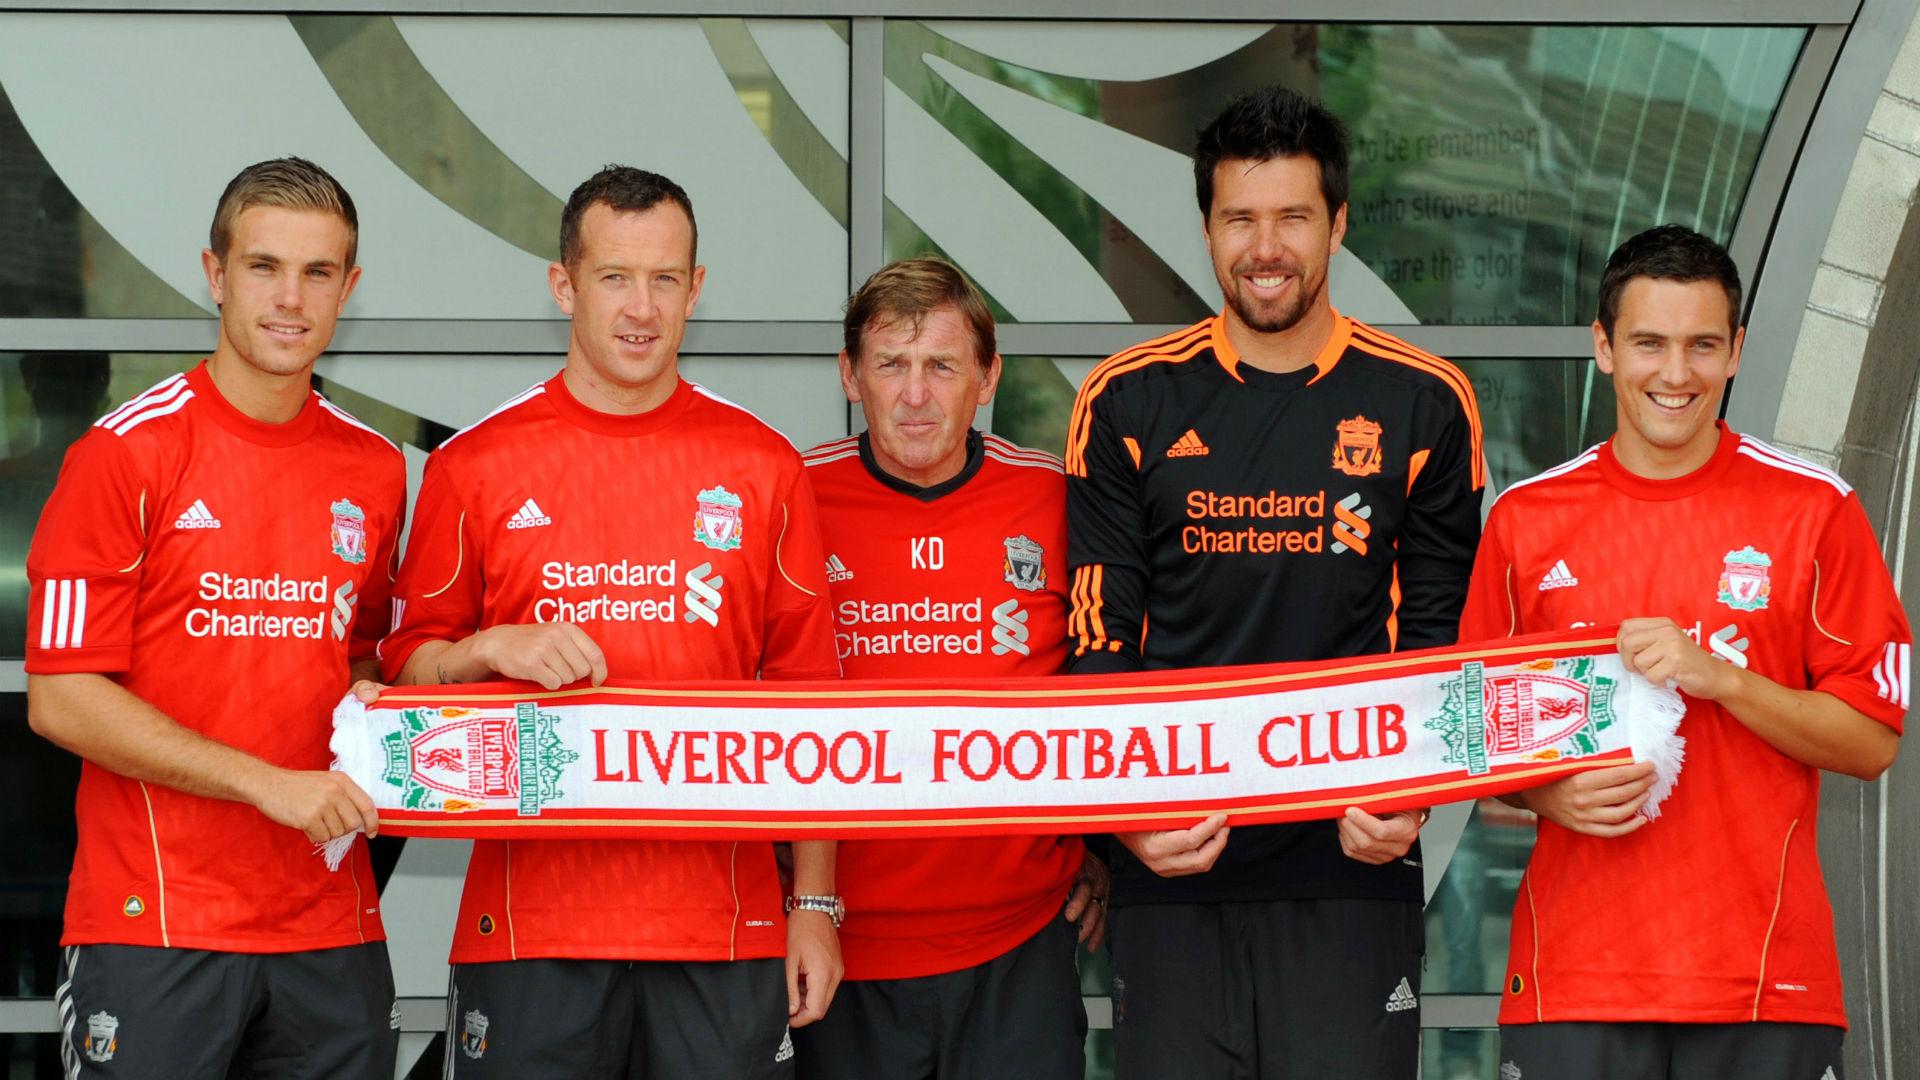 Kenny Dalglish Liverpool Jordan Henderson Charlie Adam Alexander Doni Stewart Downing 2011